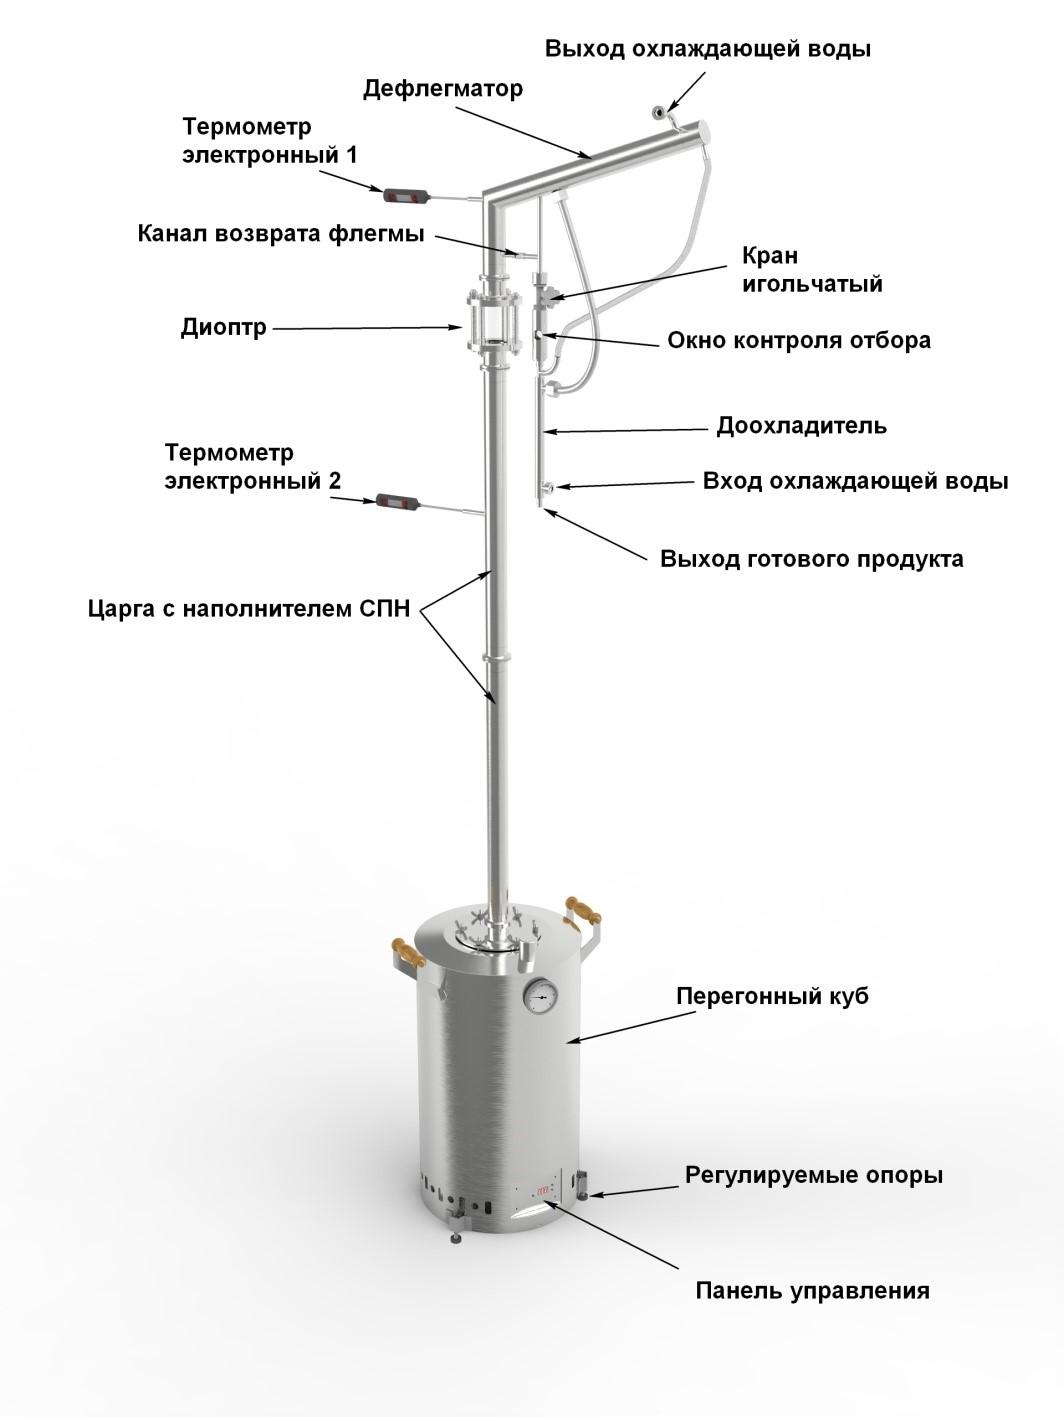 http://domashnie-tradicii.ru/images/upload/Режим%20ректификации%20на%20колонне%20АЛКОВАР%2038.jpg